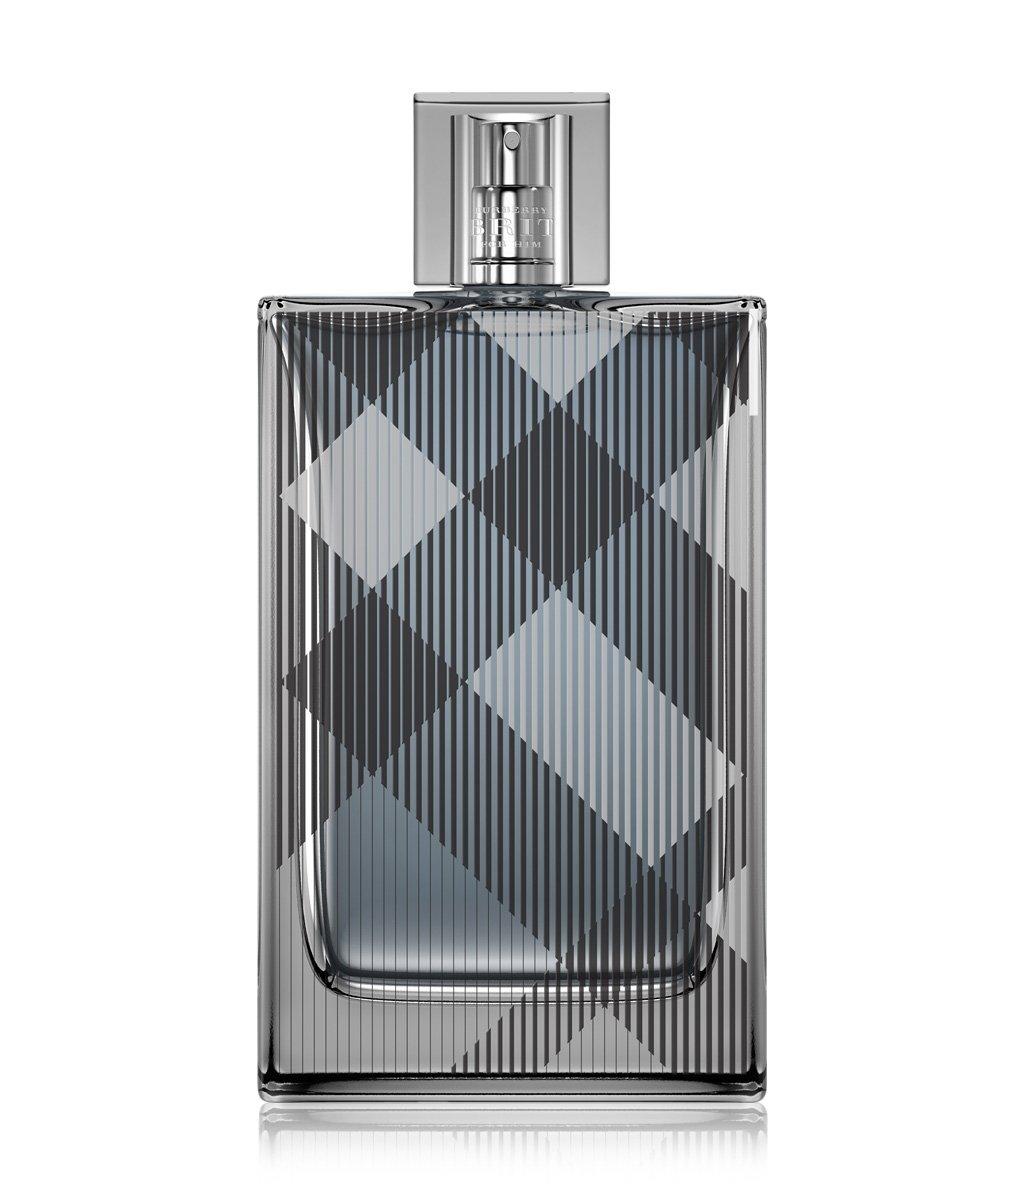 burberry brit for men parfum online bestellen flaconi. Black Bedroom Furniture Sets. Home Design Ideas